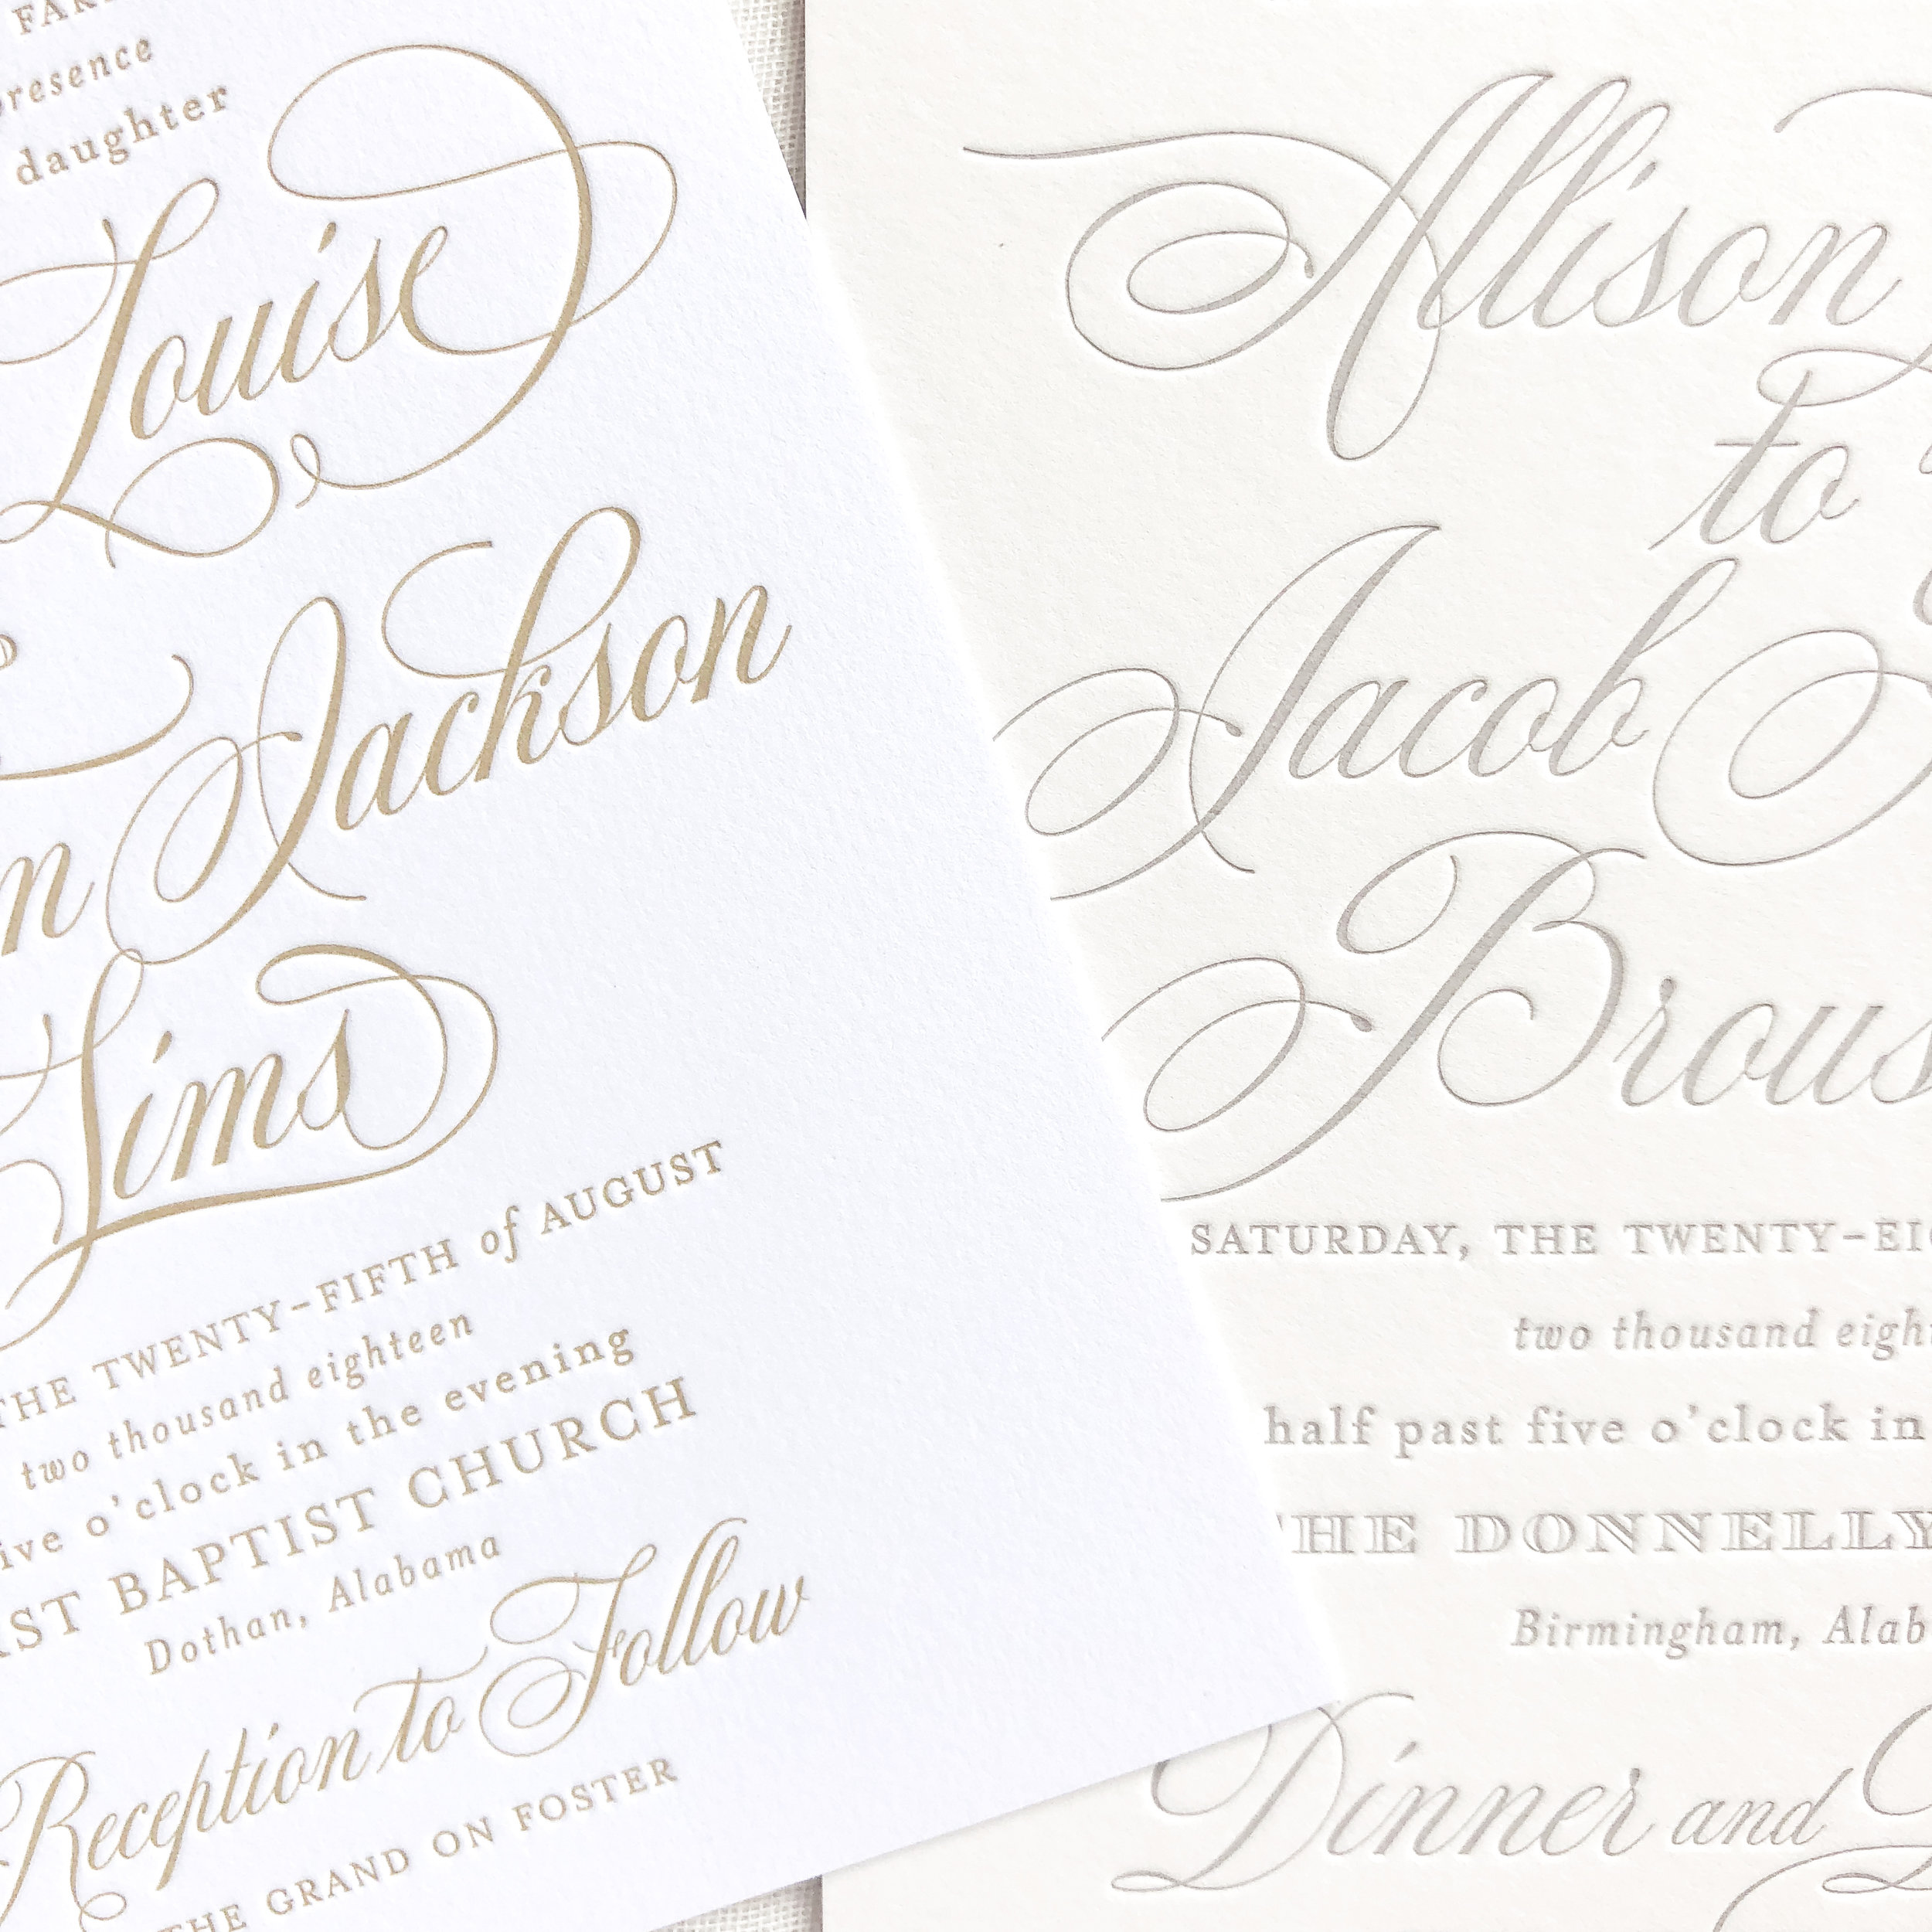 White paper    (left) versus  Ivory Paper  (right) Both samples are letterpress